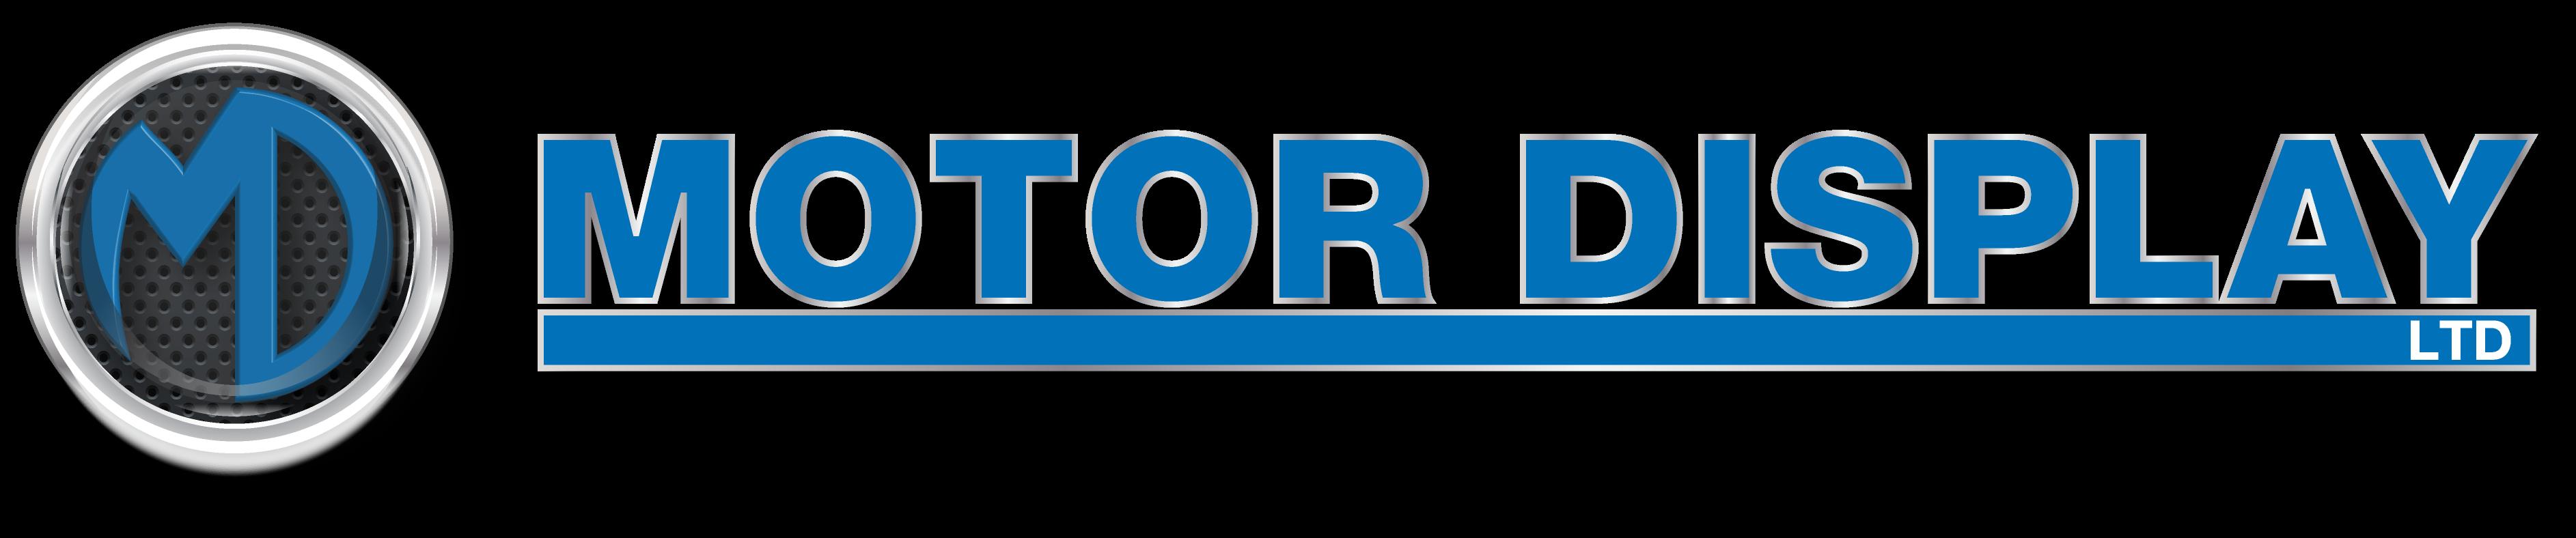 Motor Display